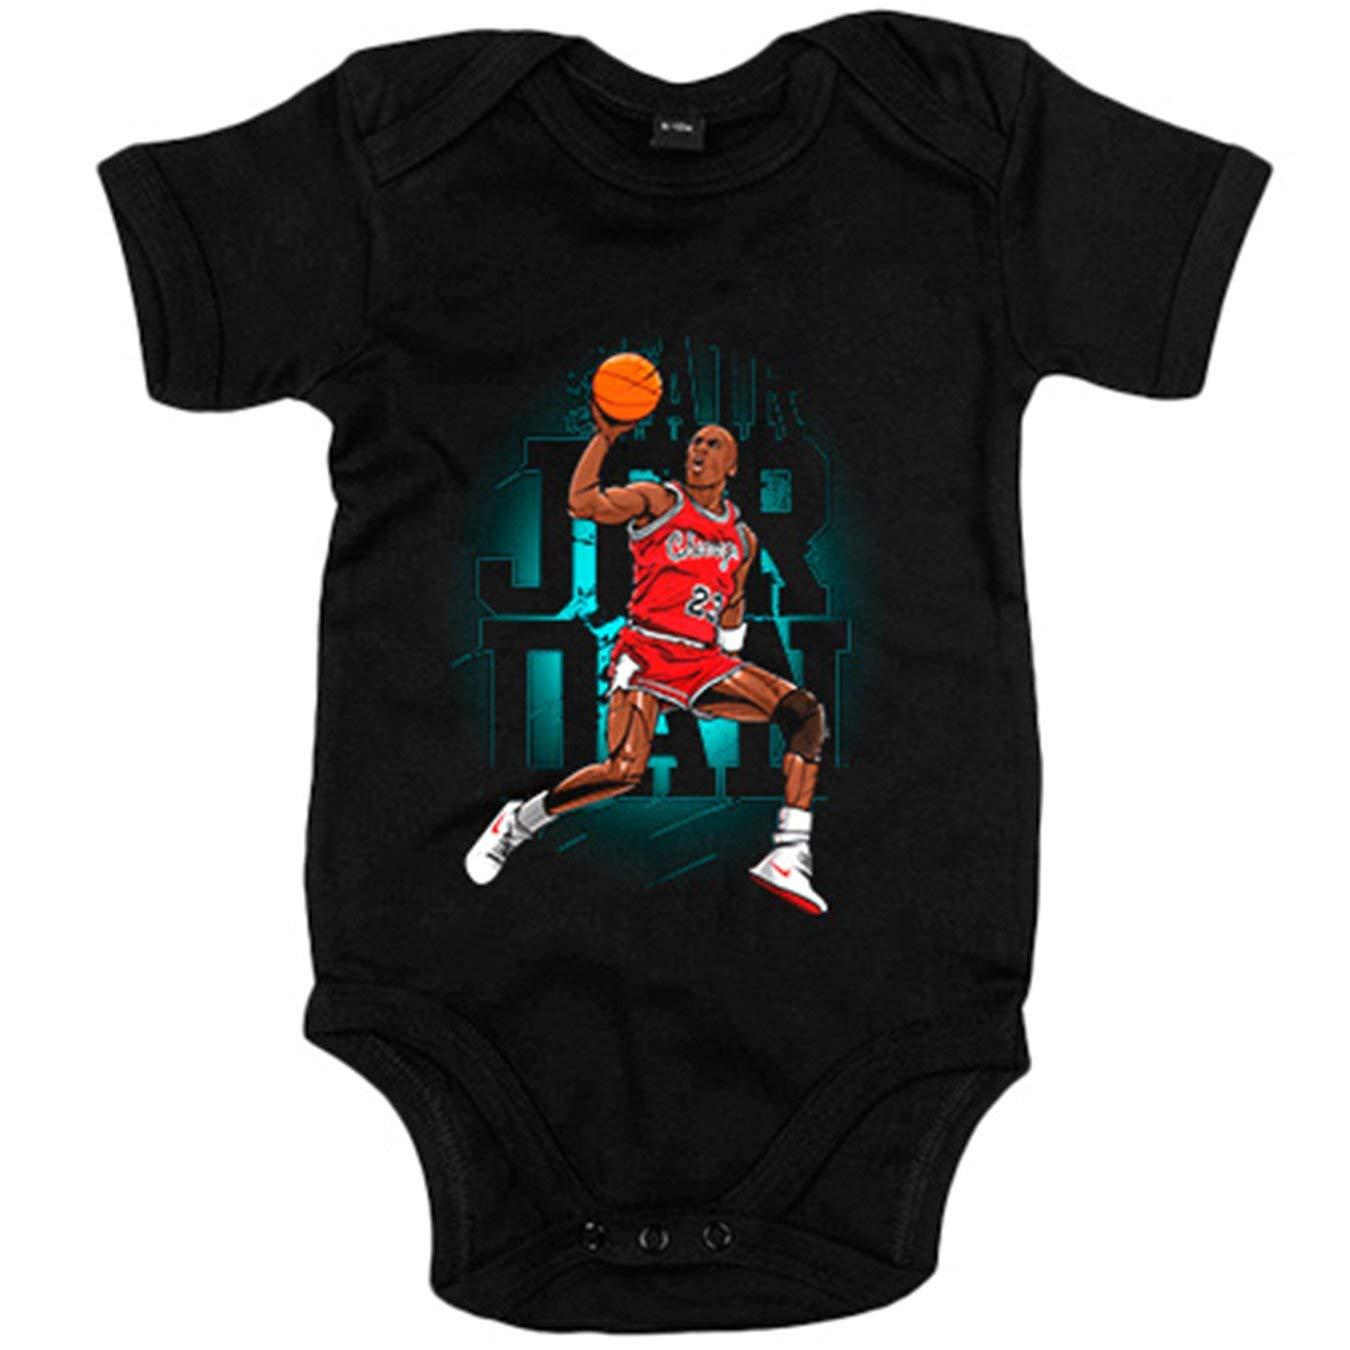 Body beb/é ilustraci/ón leyenda del baloncesto 23 Chicago Blanco 6-12 meses